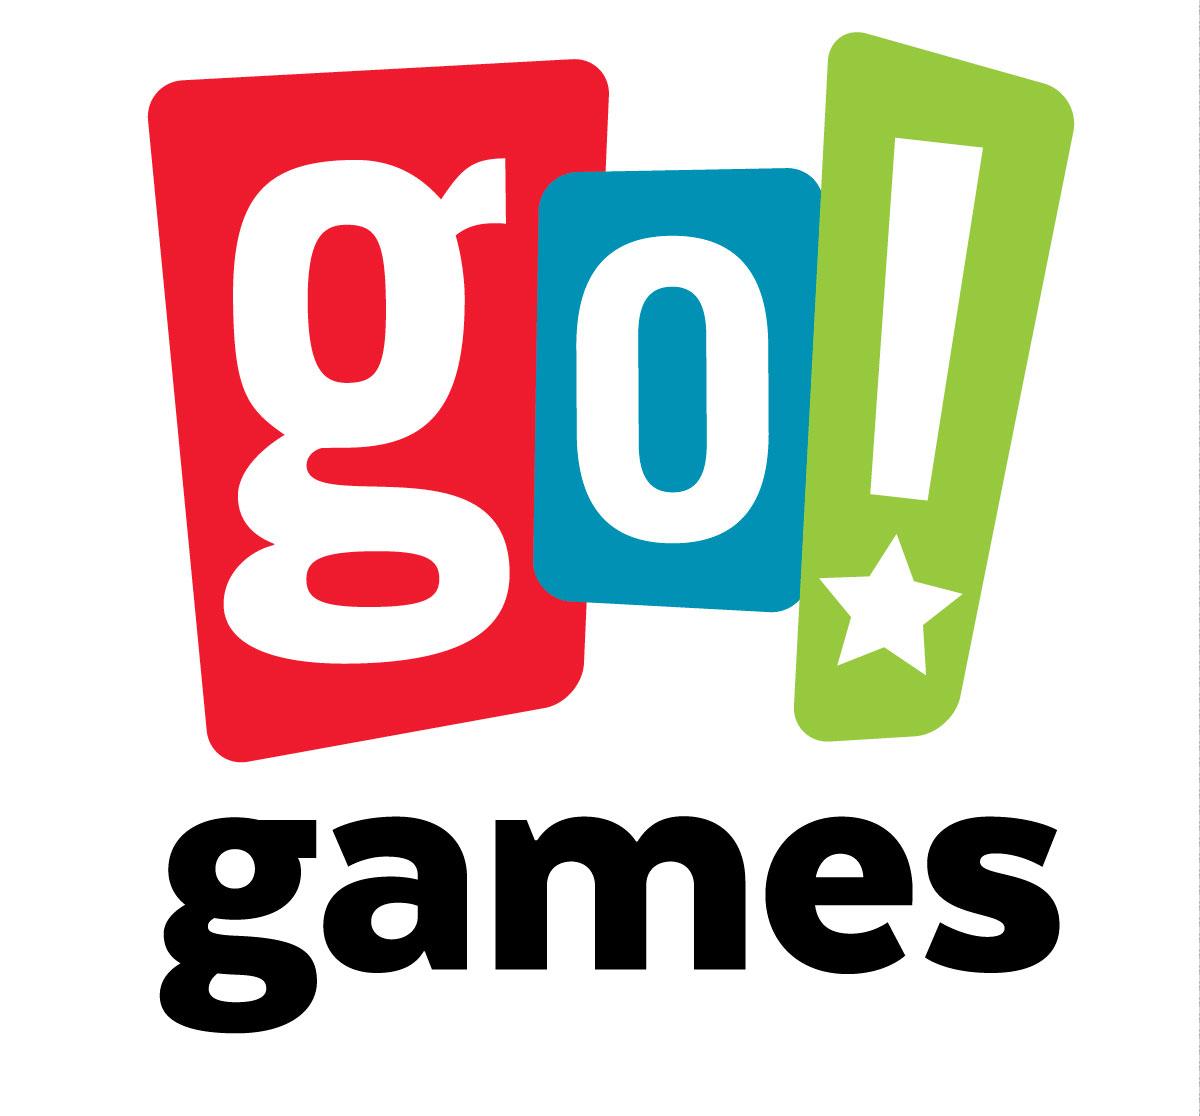 Go! Games Logo10.2021